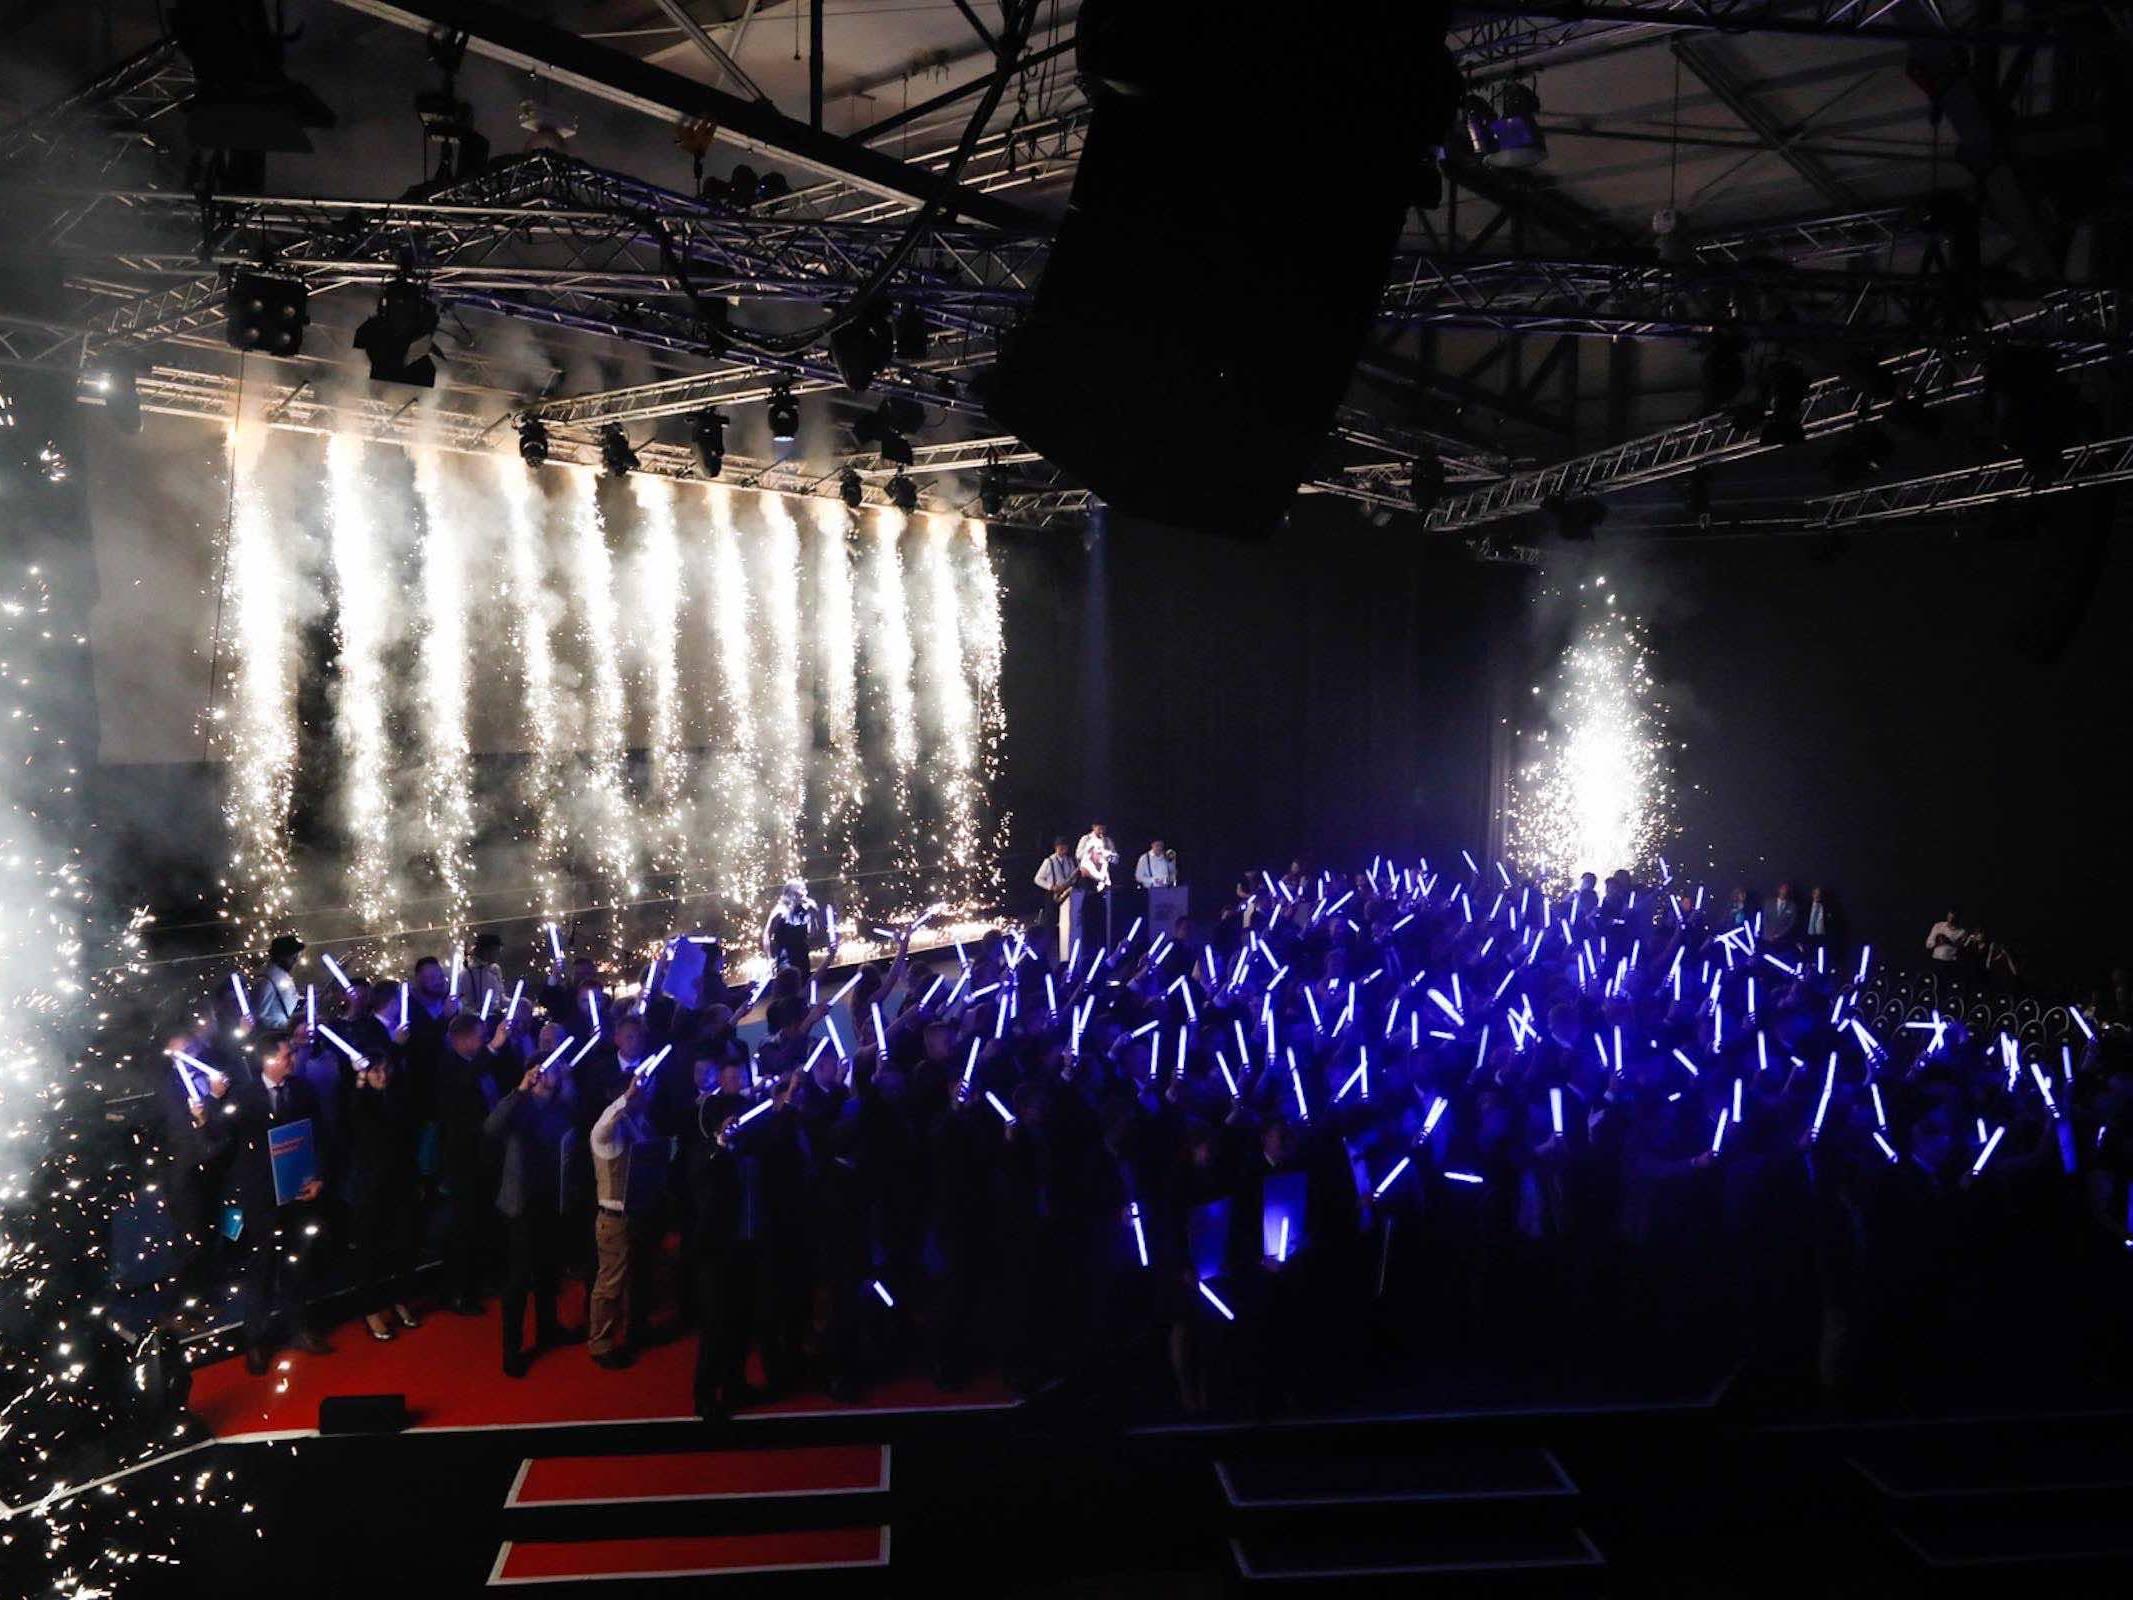 Band | Hamburg | Liveband | Livemusik | Walking | Act | Partyband | Jazzband | Swingband | Loungeband | Popband | Jazz | Saxophonist | Bühnenshow | Showband | Hochzeit | Messe | Firmenfeier | Charity | Gala | Hamburgfeiert